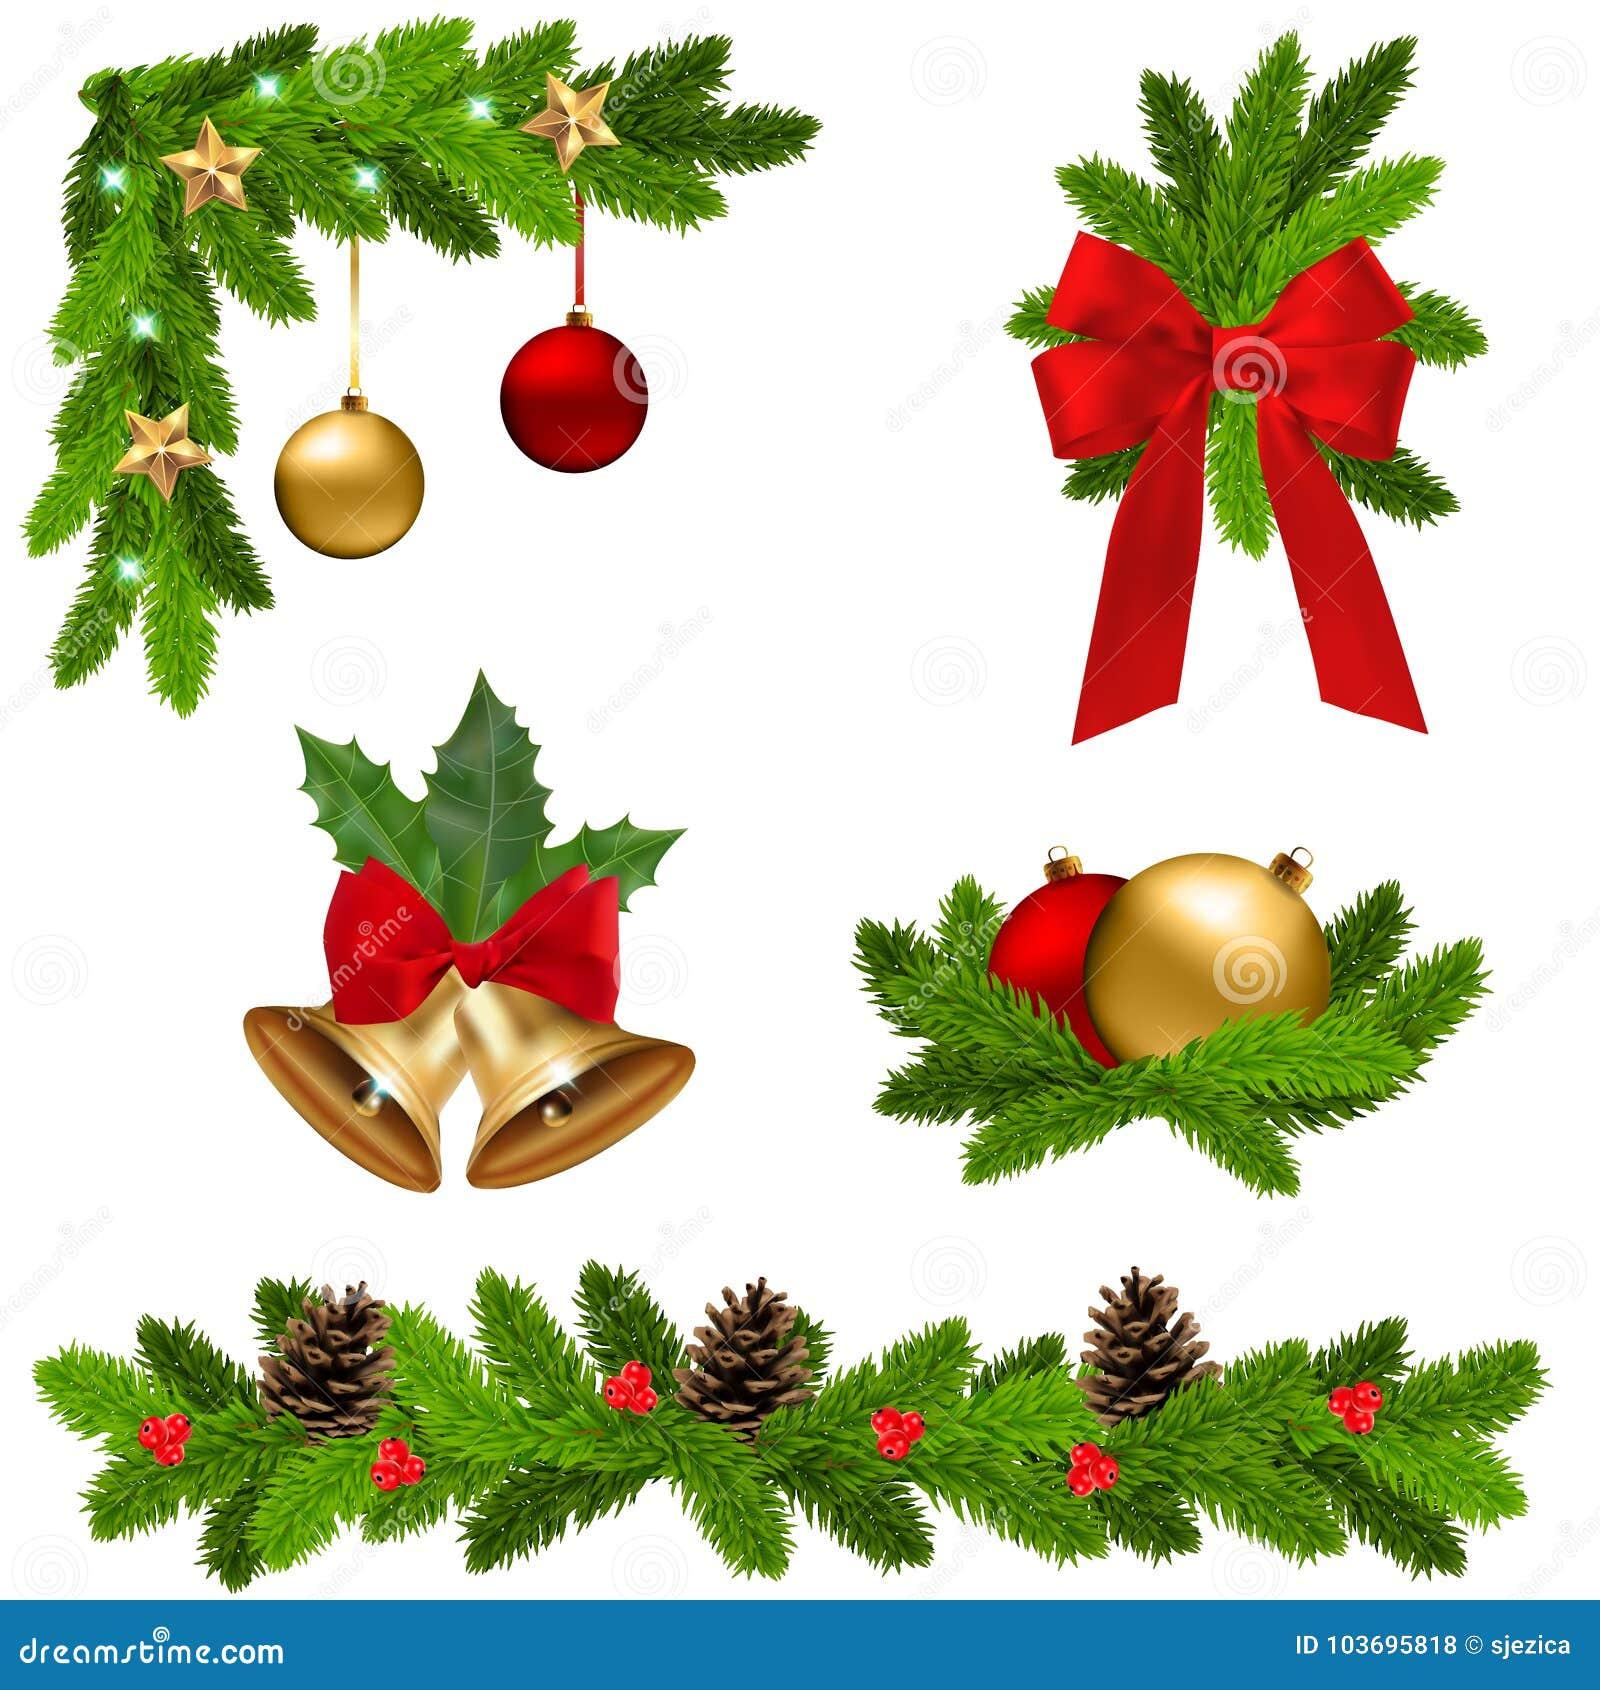 Set Of Vector Christmas Decorations Stock Vector Illustration Of Branch Balls 103695818